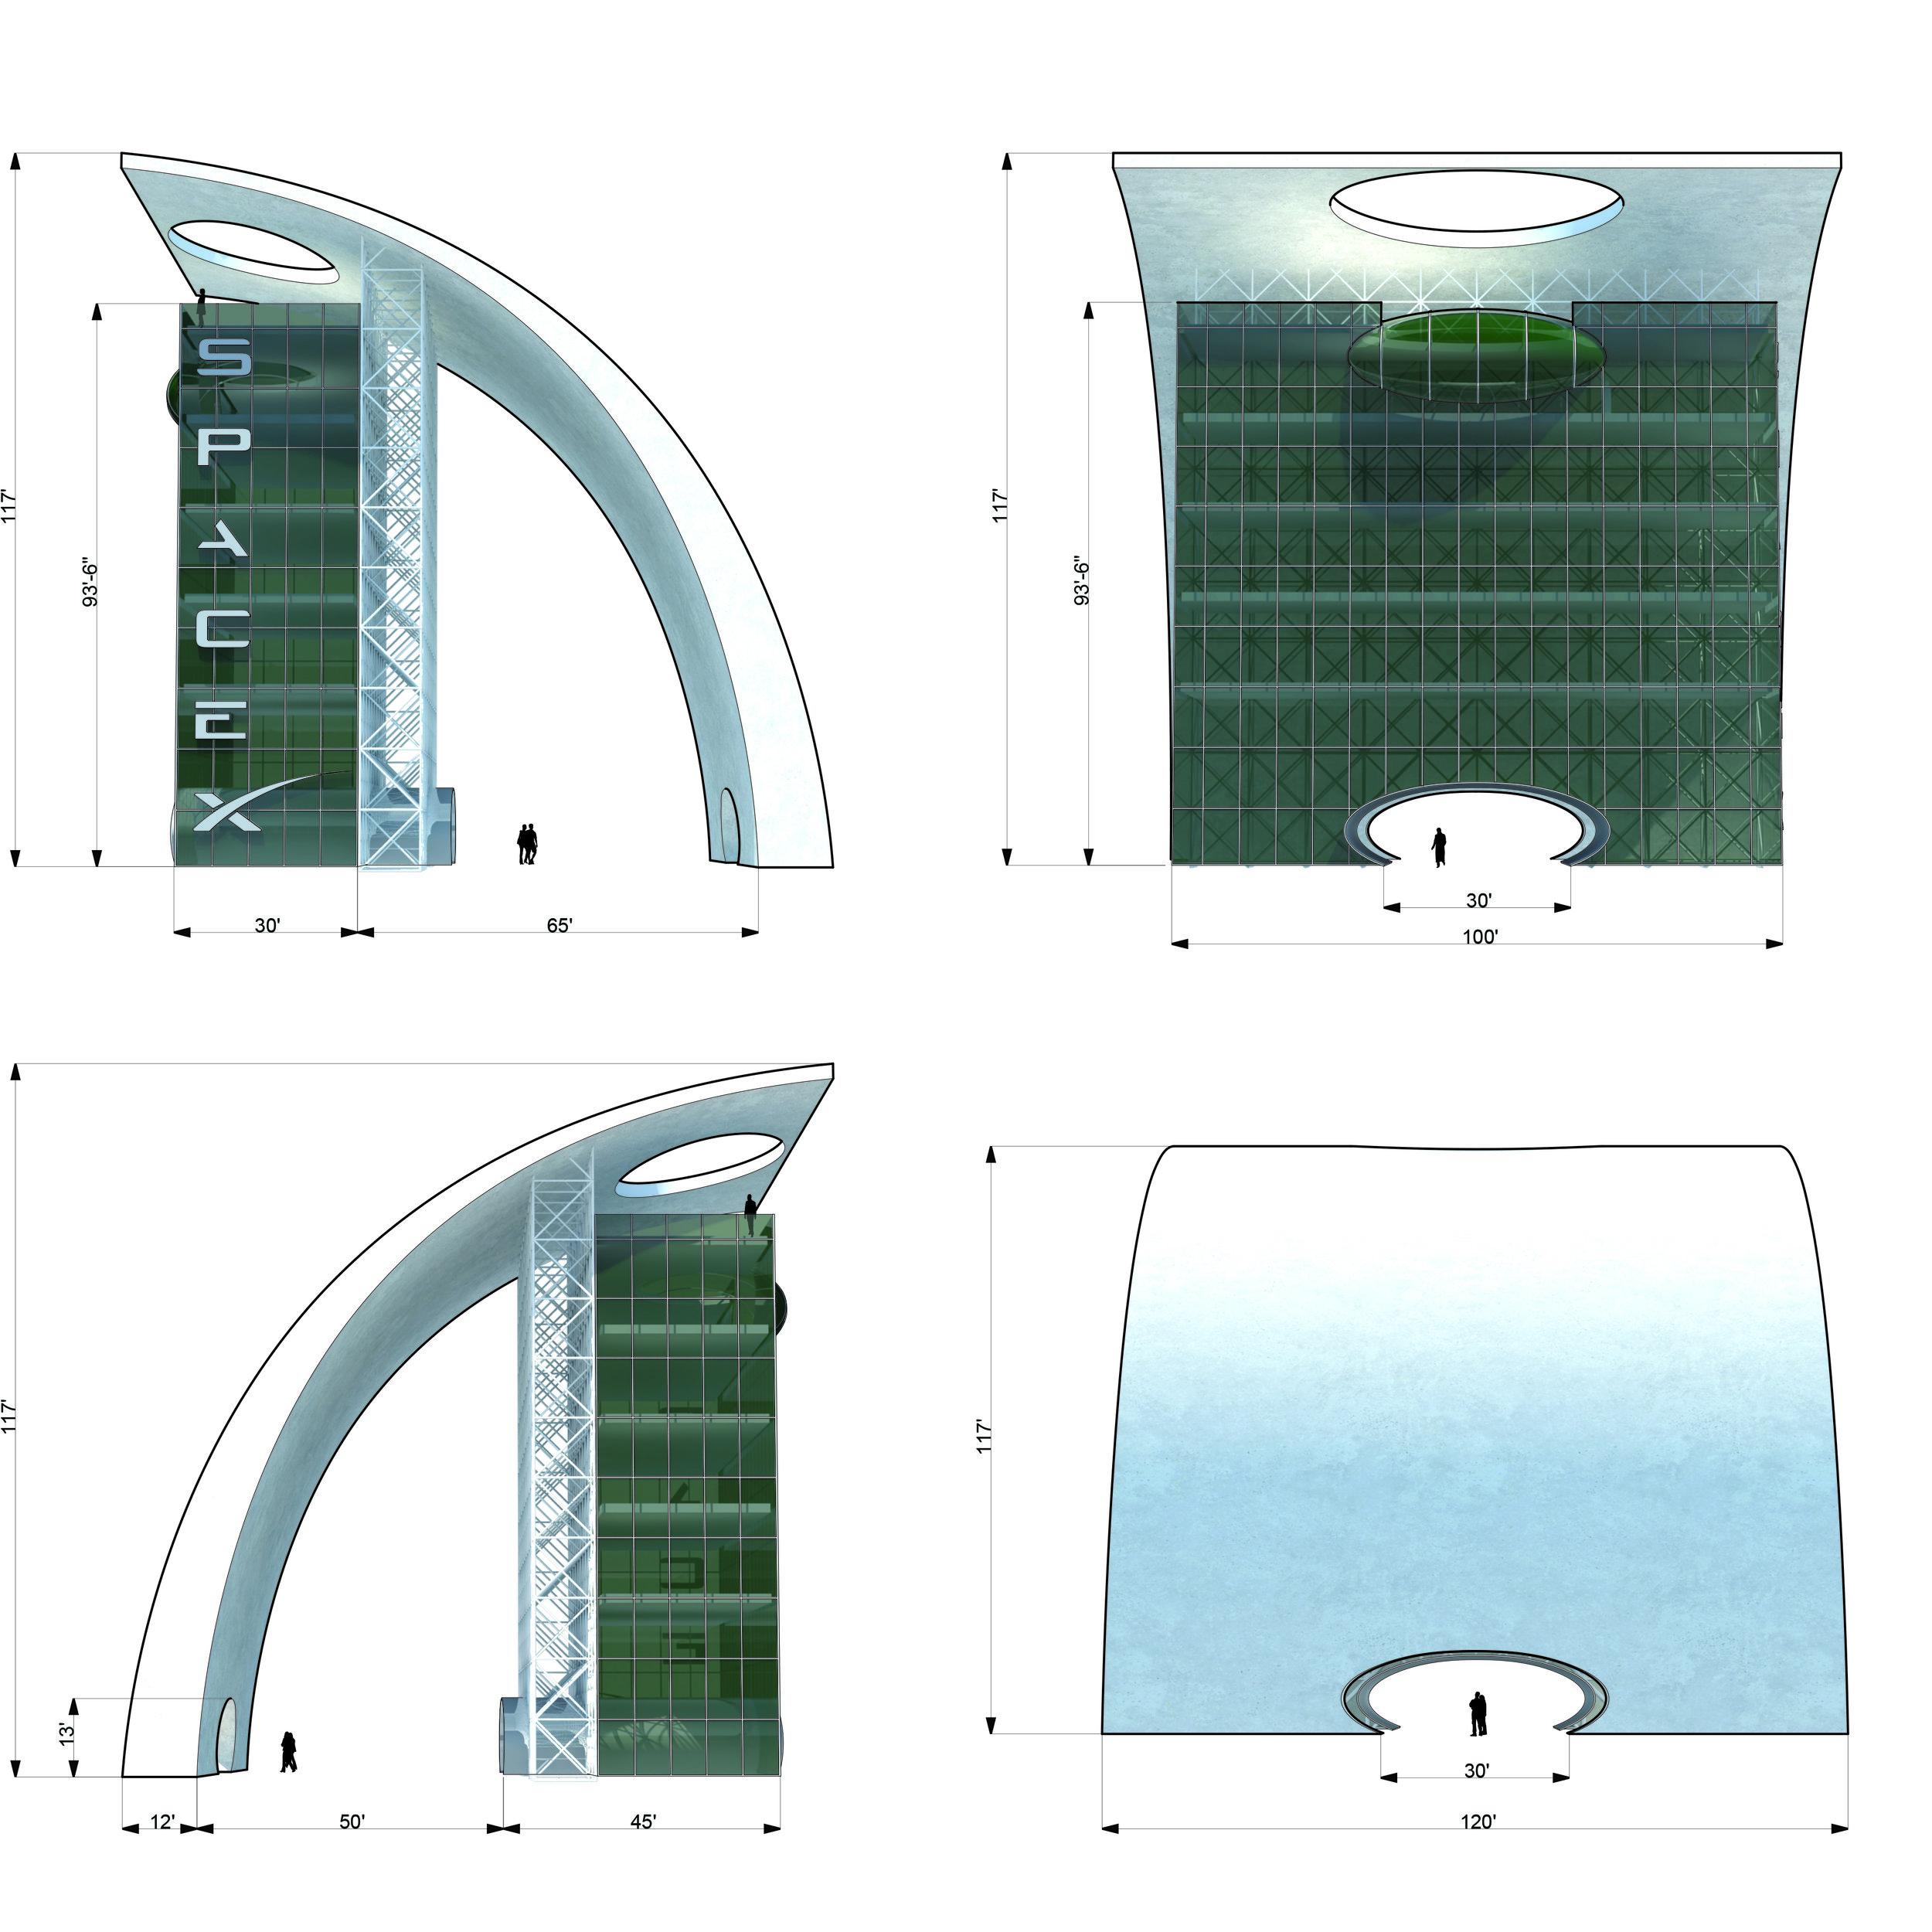 S.E.A.-Studio-Environmental-Architecture-David-Hertz-FAIA-Launch-Facility-Cape-Canaveral-Florida-sustainable-regenerative-restorative-green-design-Spacex-rocket-spaceship-astronaut-cosmos-space-exploration-cosmic-interstellar-tower-cool-elevations.jpg